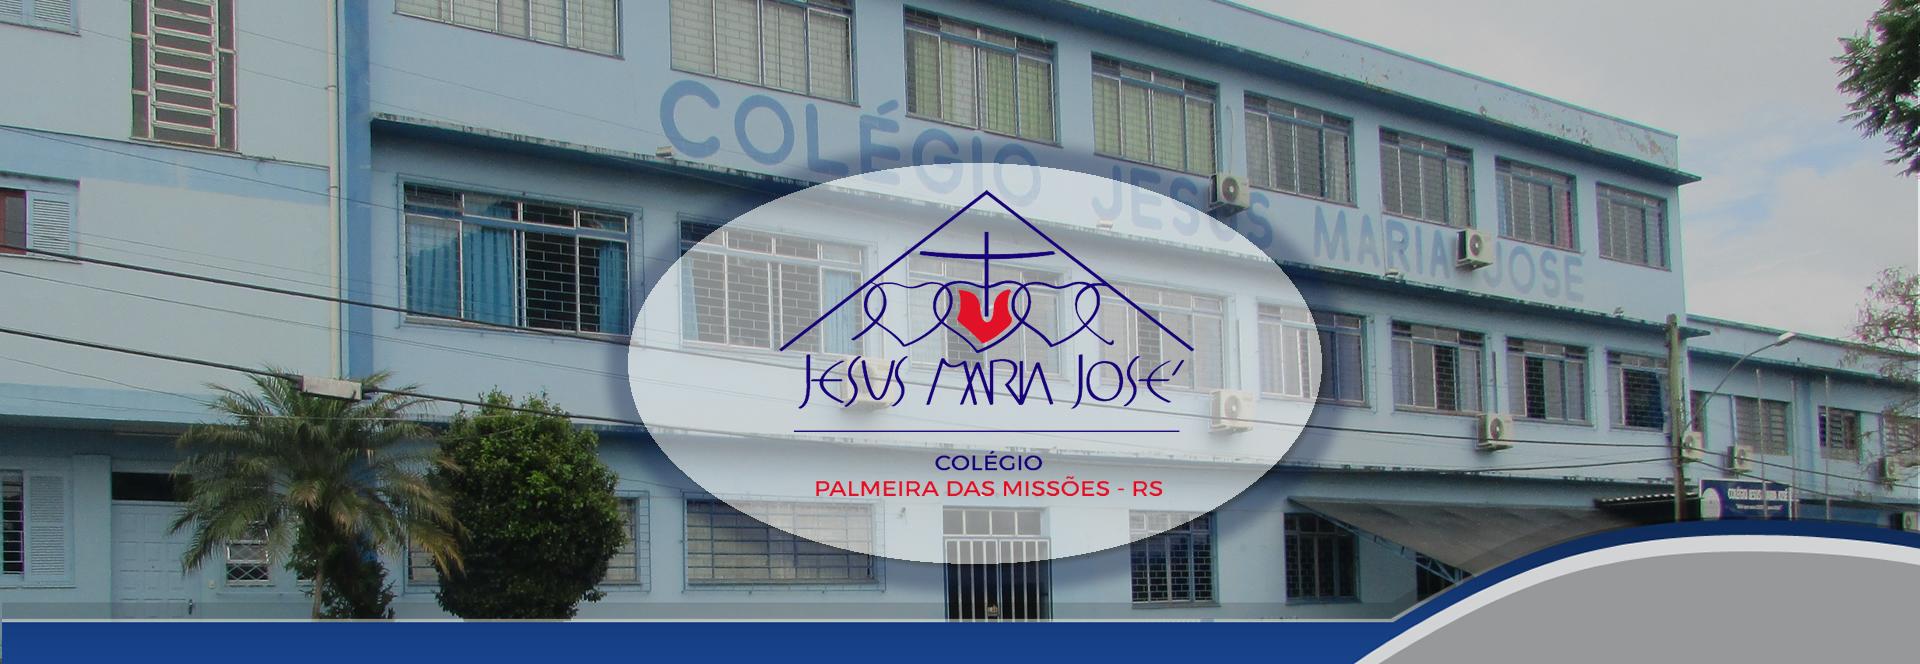 Banner Faixada do Colégio